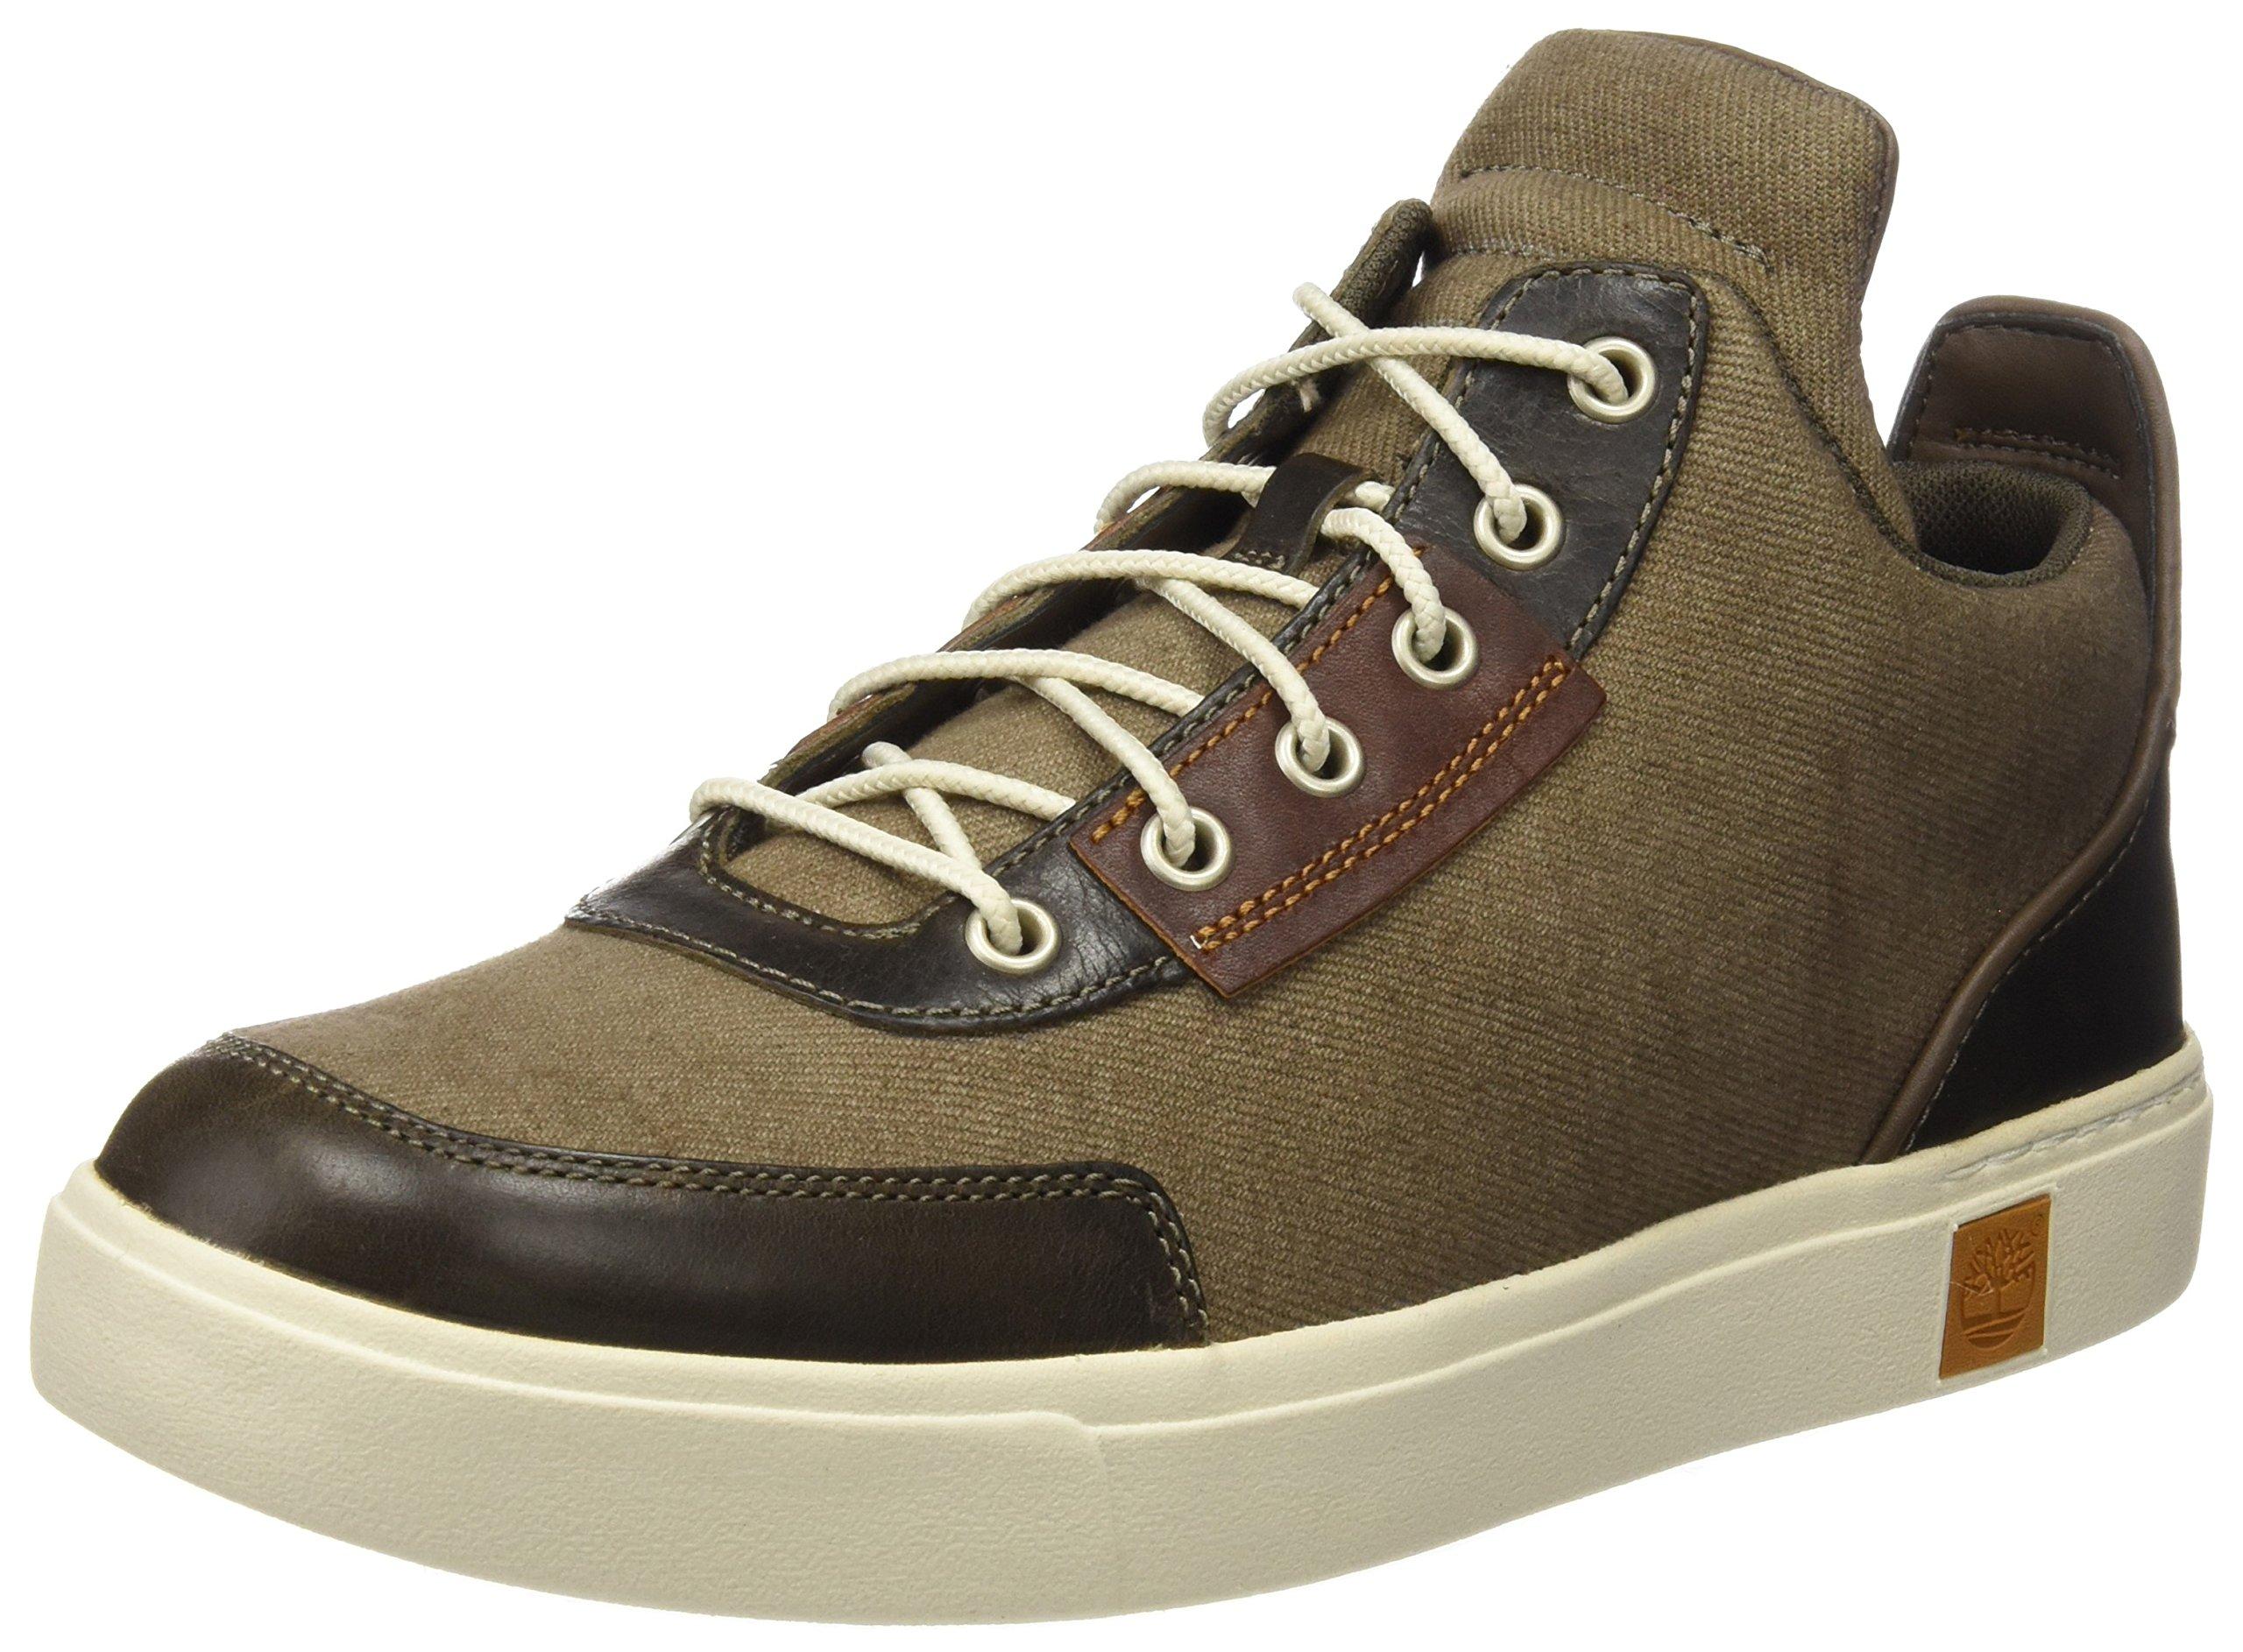 Timberland Men's Amherst Chukka Fashion Sneaker, Canteen Cotton Canvas, 9.5 M US